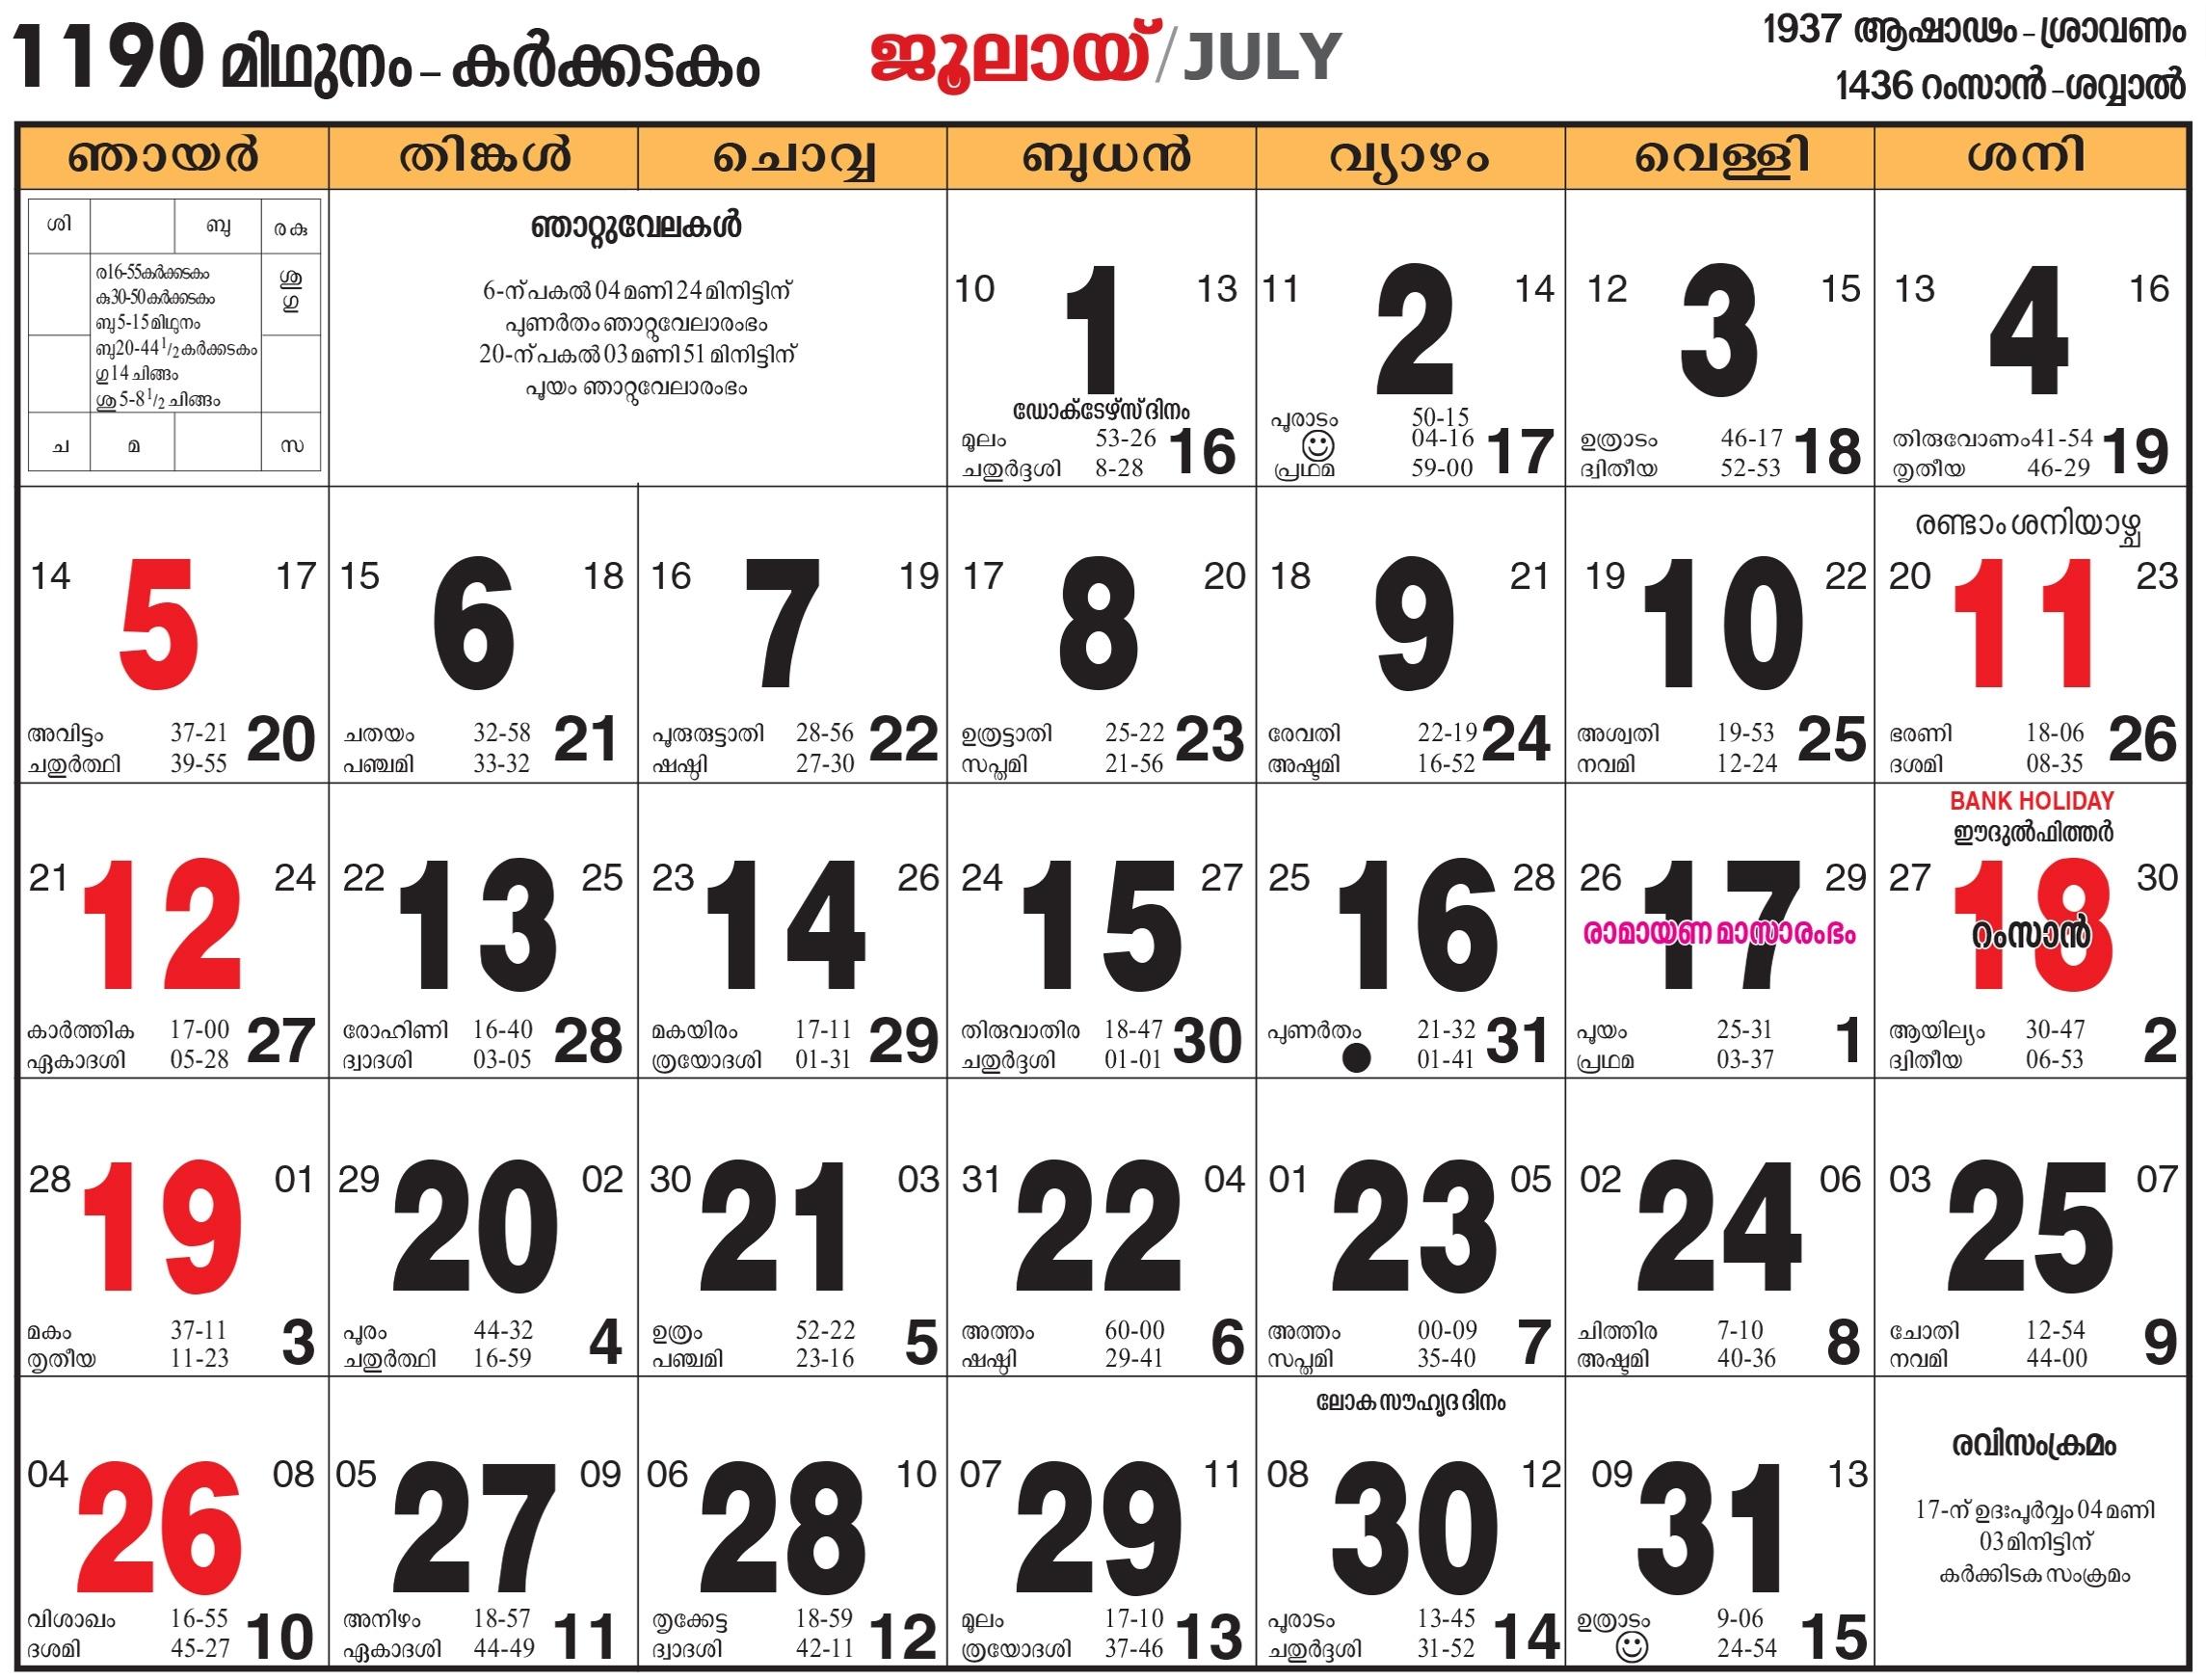 Mathrubhumi Calendar 2016 Pdf | Thegioithamdep in November 2015 Malayala Manorama Calendar